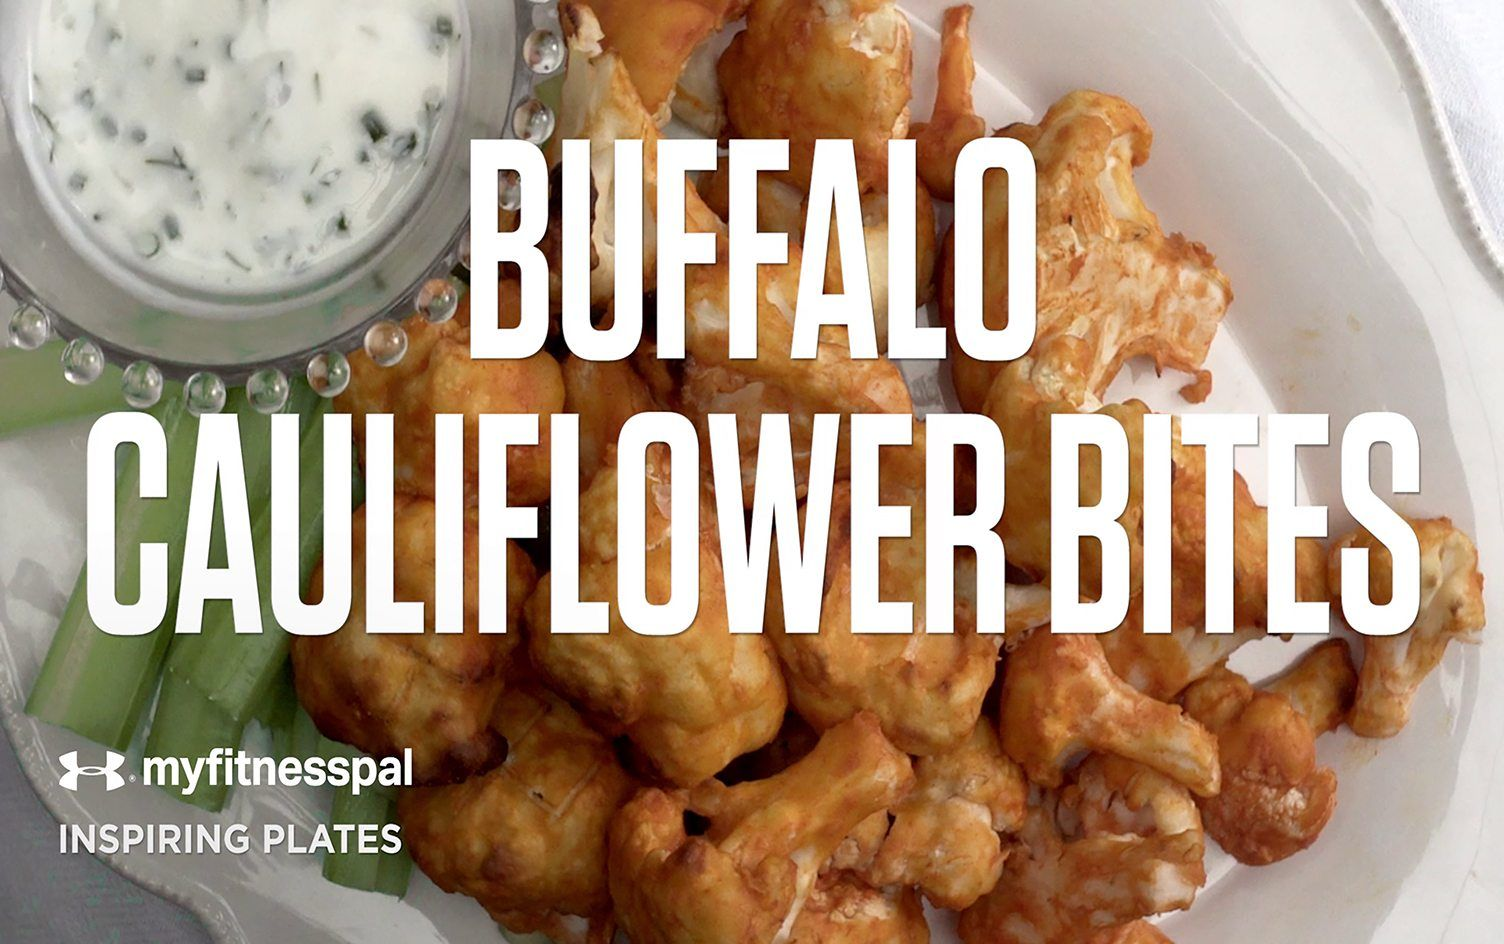 Recipe: Buffalo Cauliflower Bites [Video]